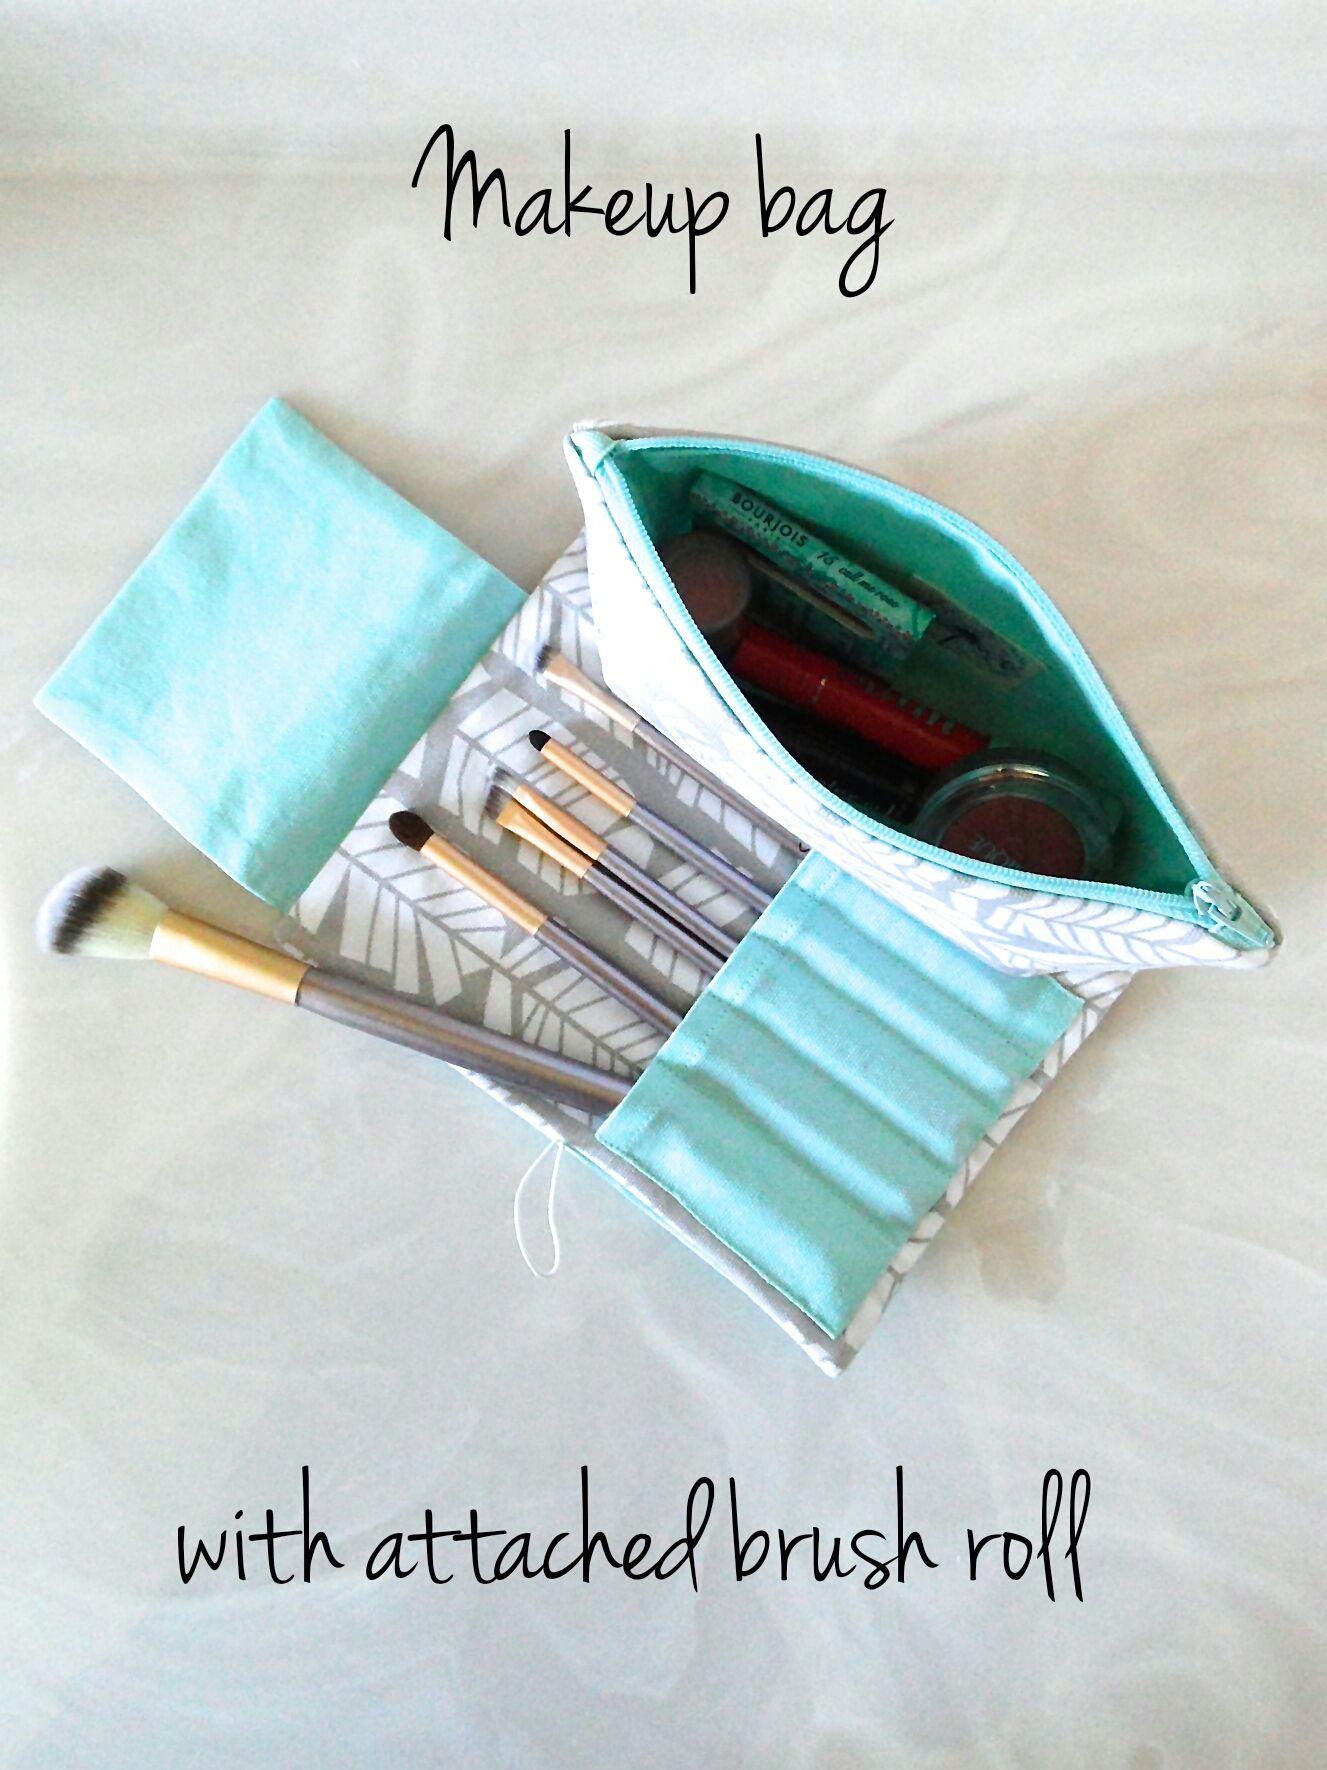 Makeup bag with attached brush roll Klaim U Makeup